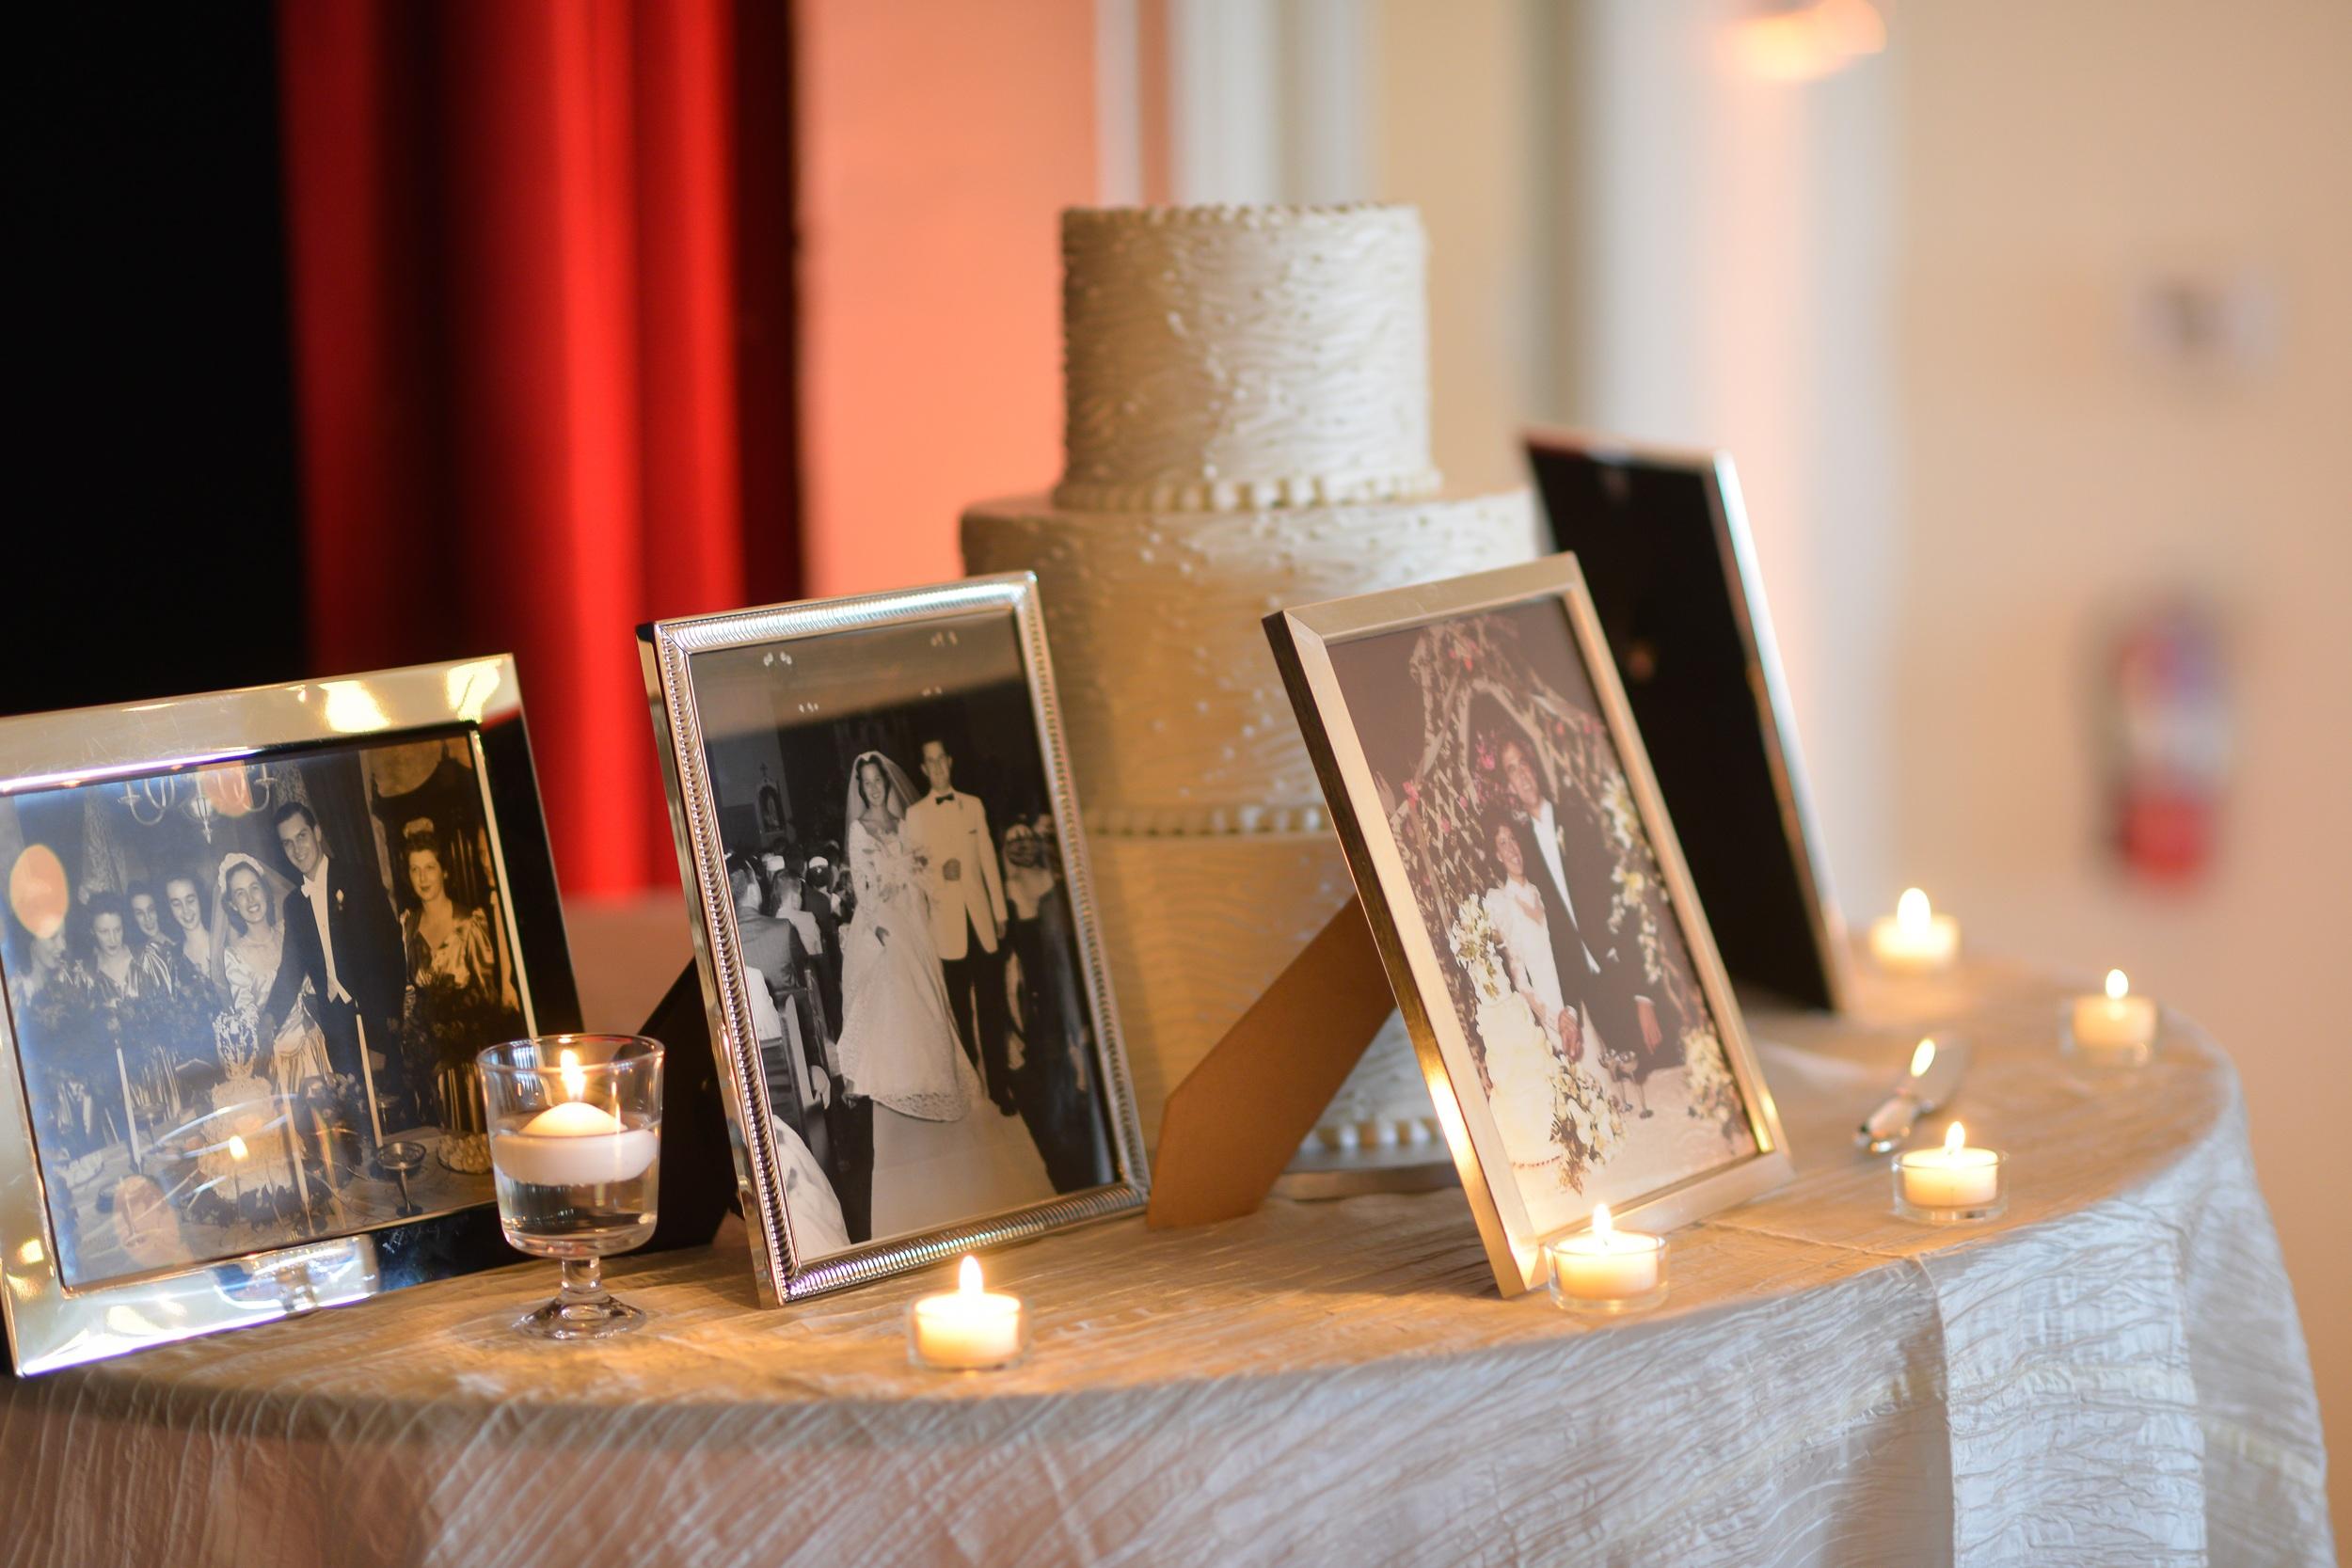 winsor event studio wedding cake family photos picture frames